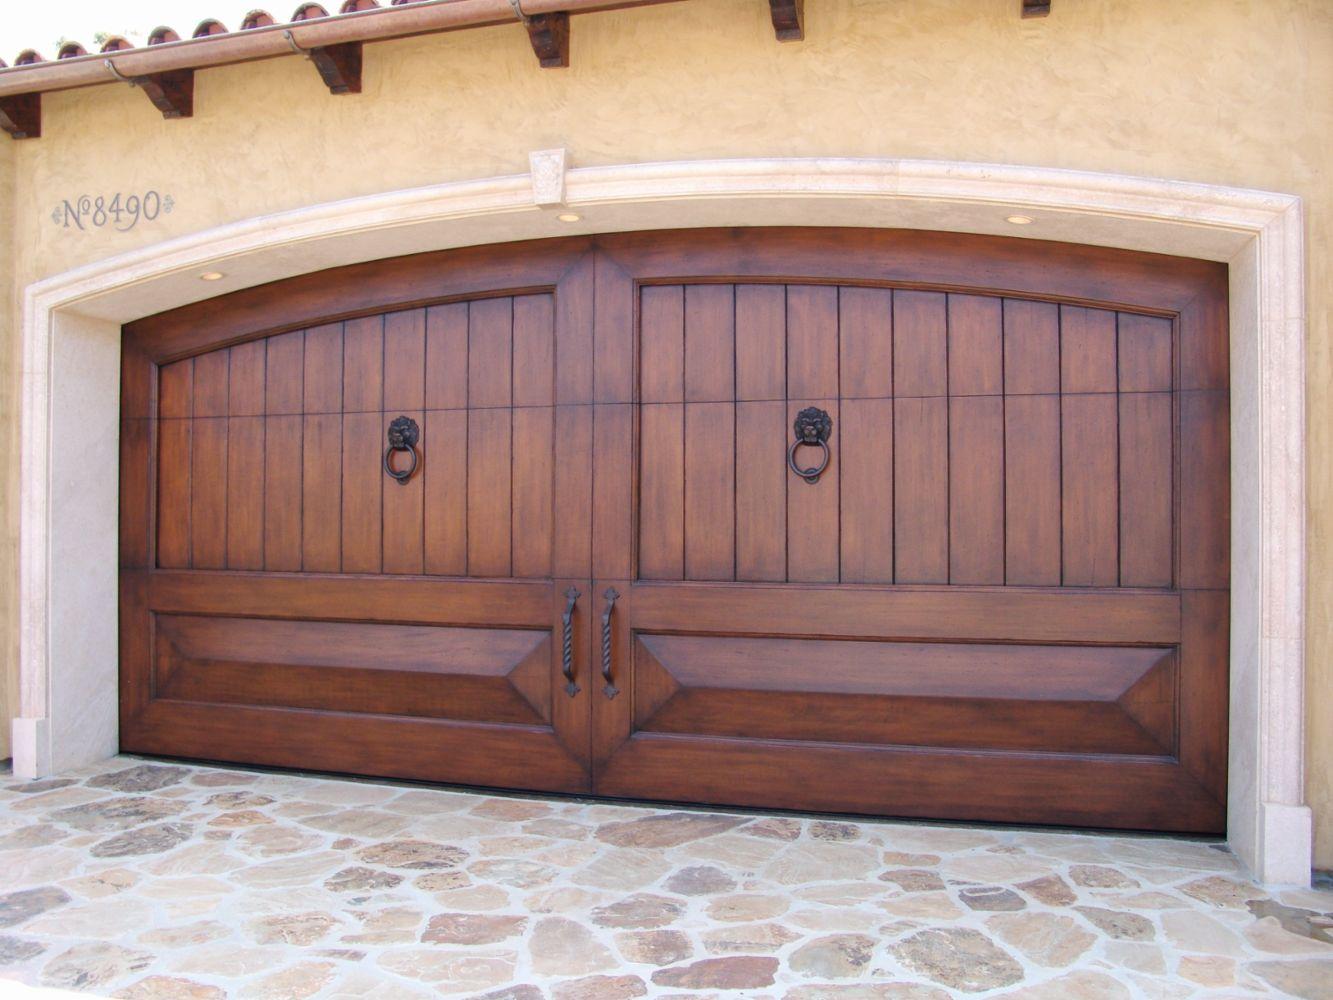 8185784826 in tarzana ca tarzana quality garage door repair for Garage door repair hollywood